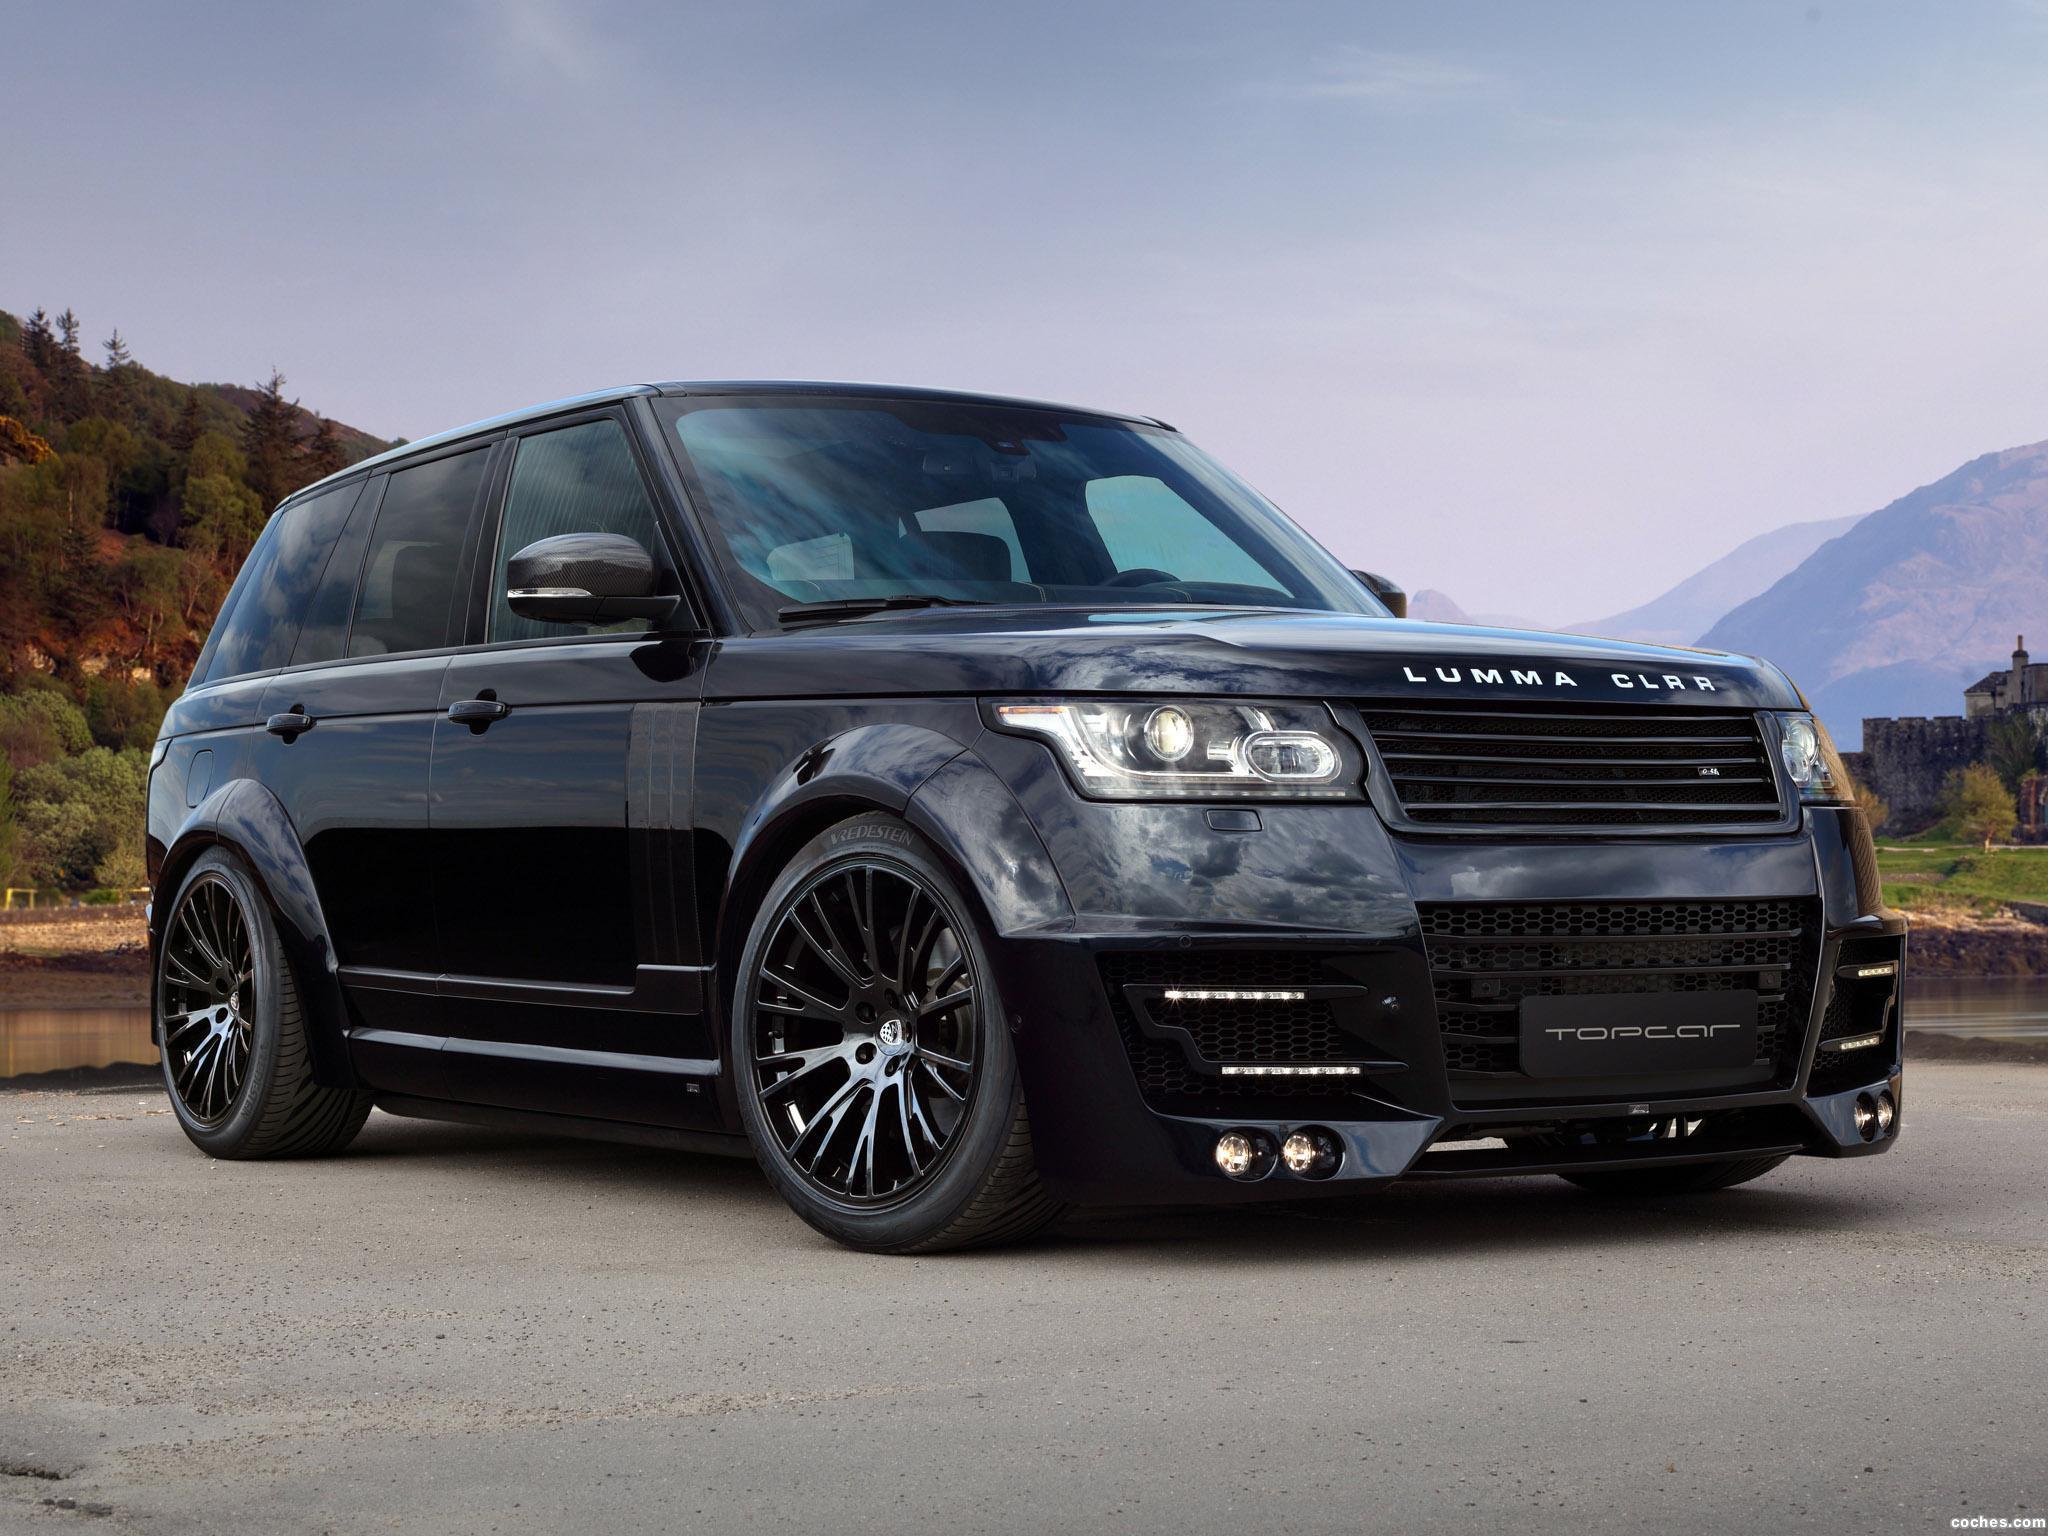 Foto 11 de Topcar Land Rover Range Rover Lumma CLR R L405 2013